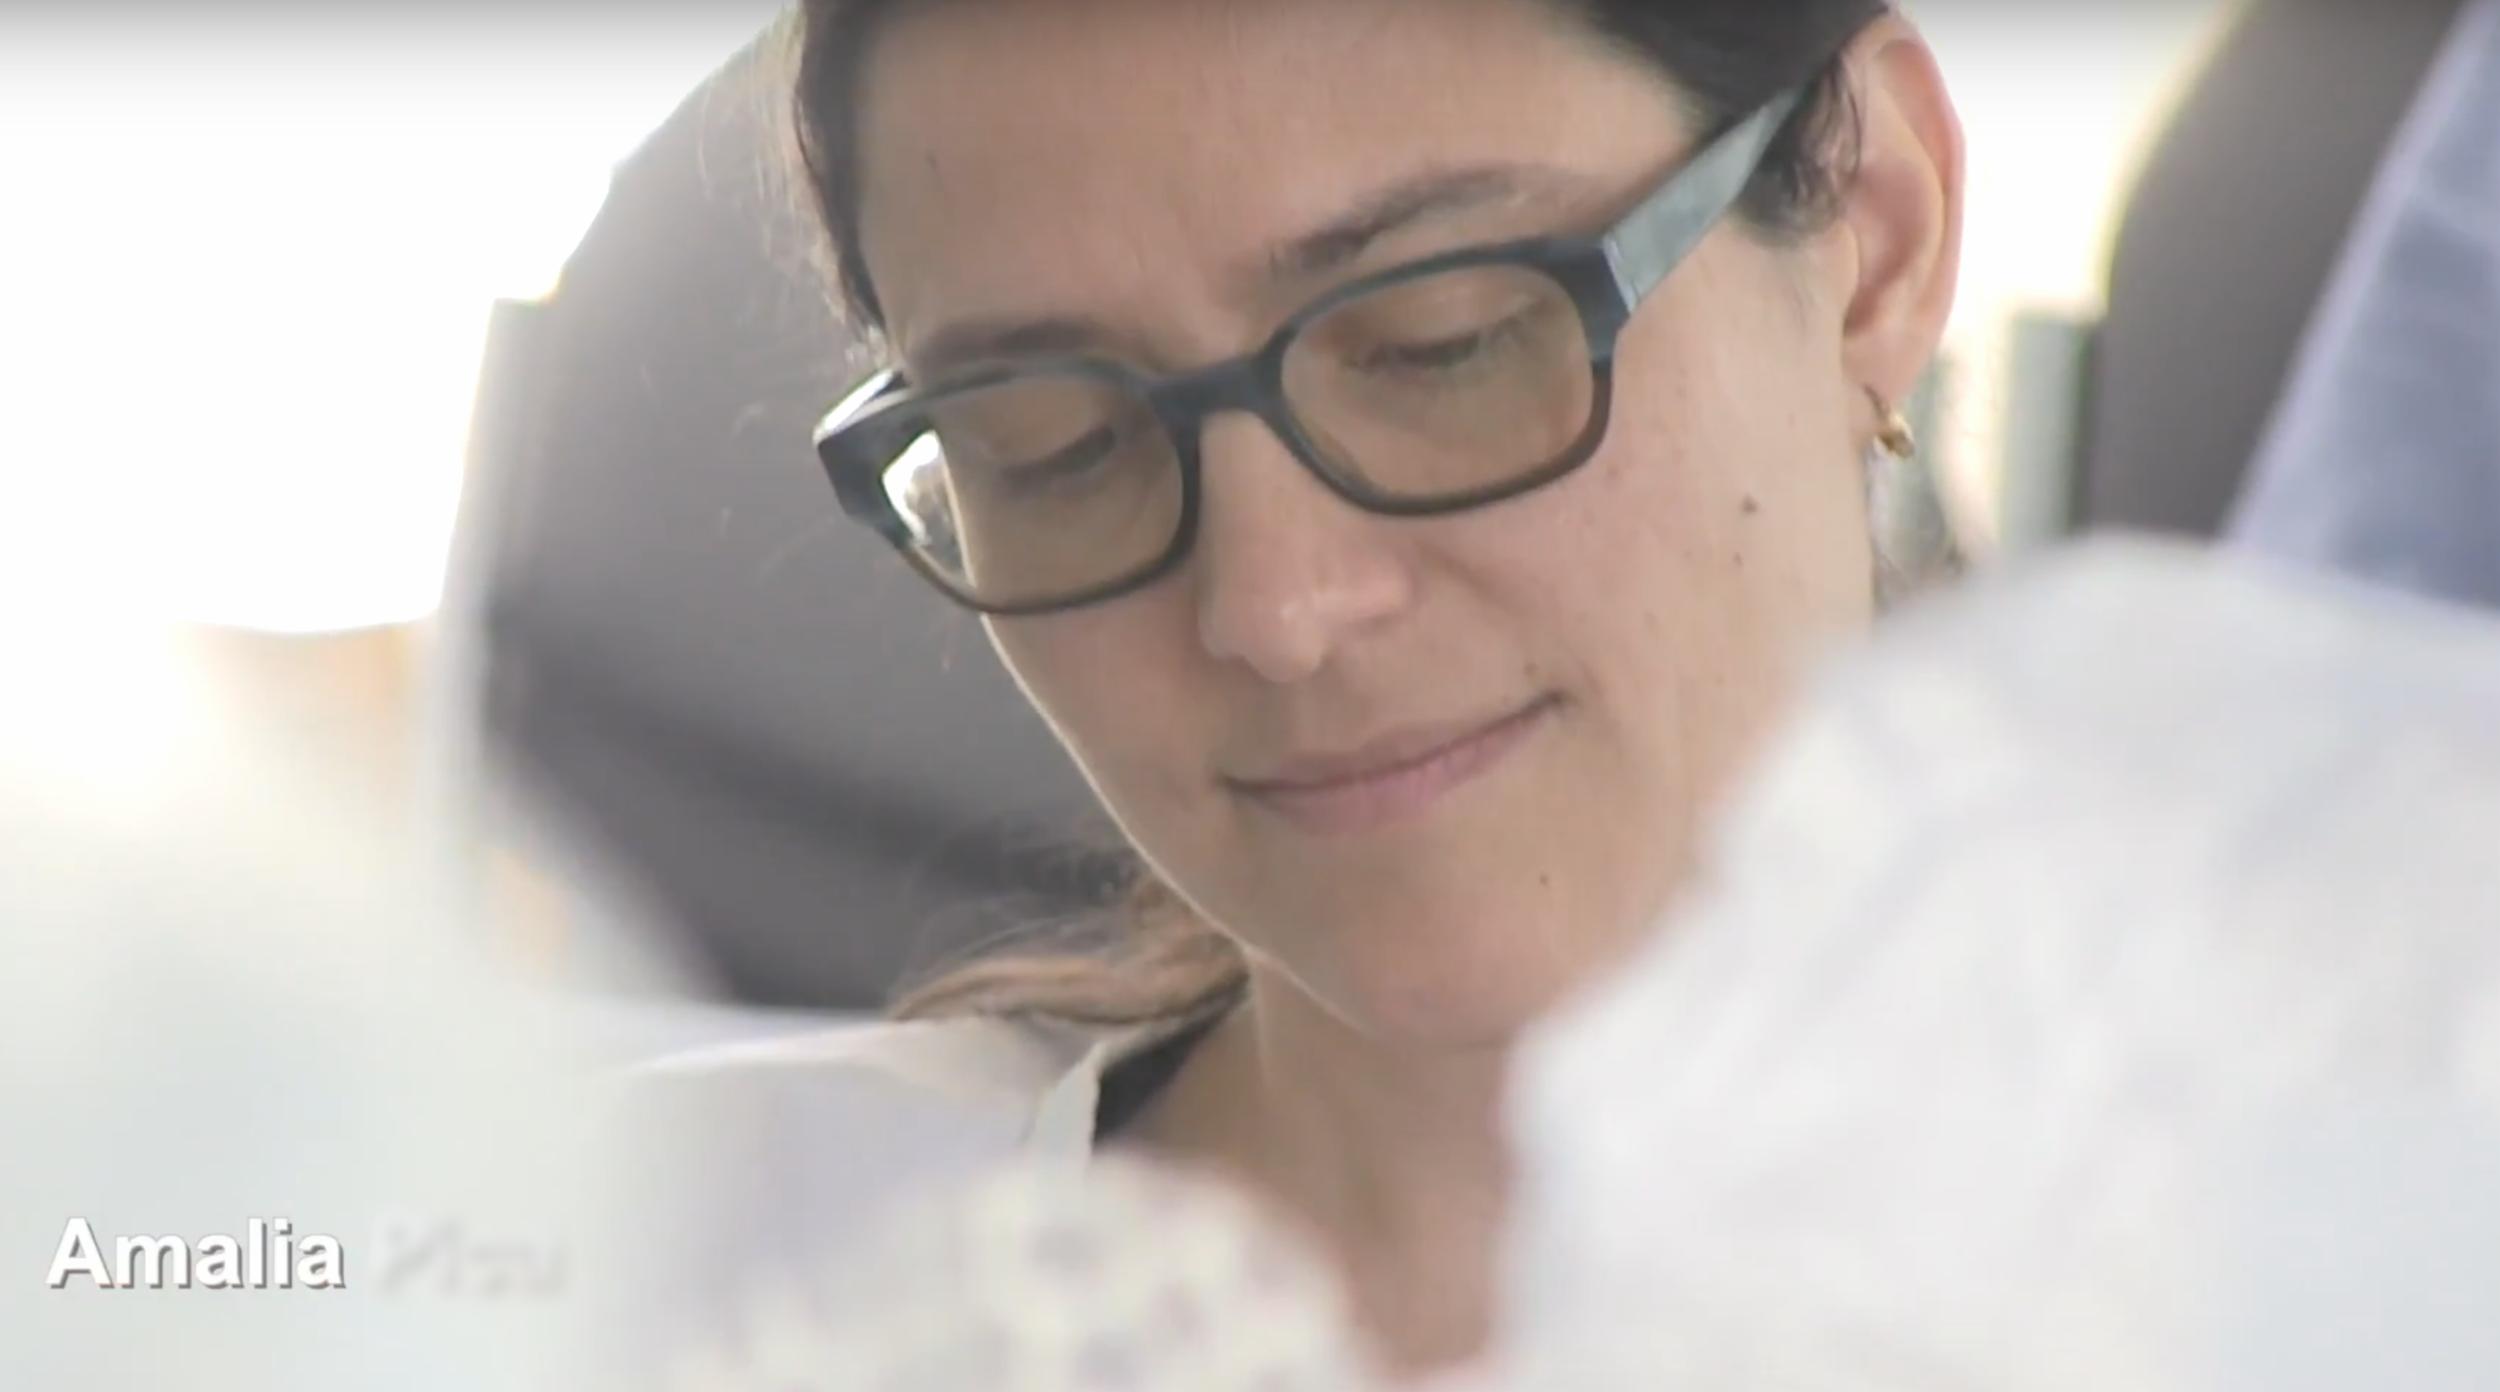 Amalia Pica in an interview film for Folkestone Triennial 2017